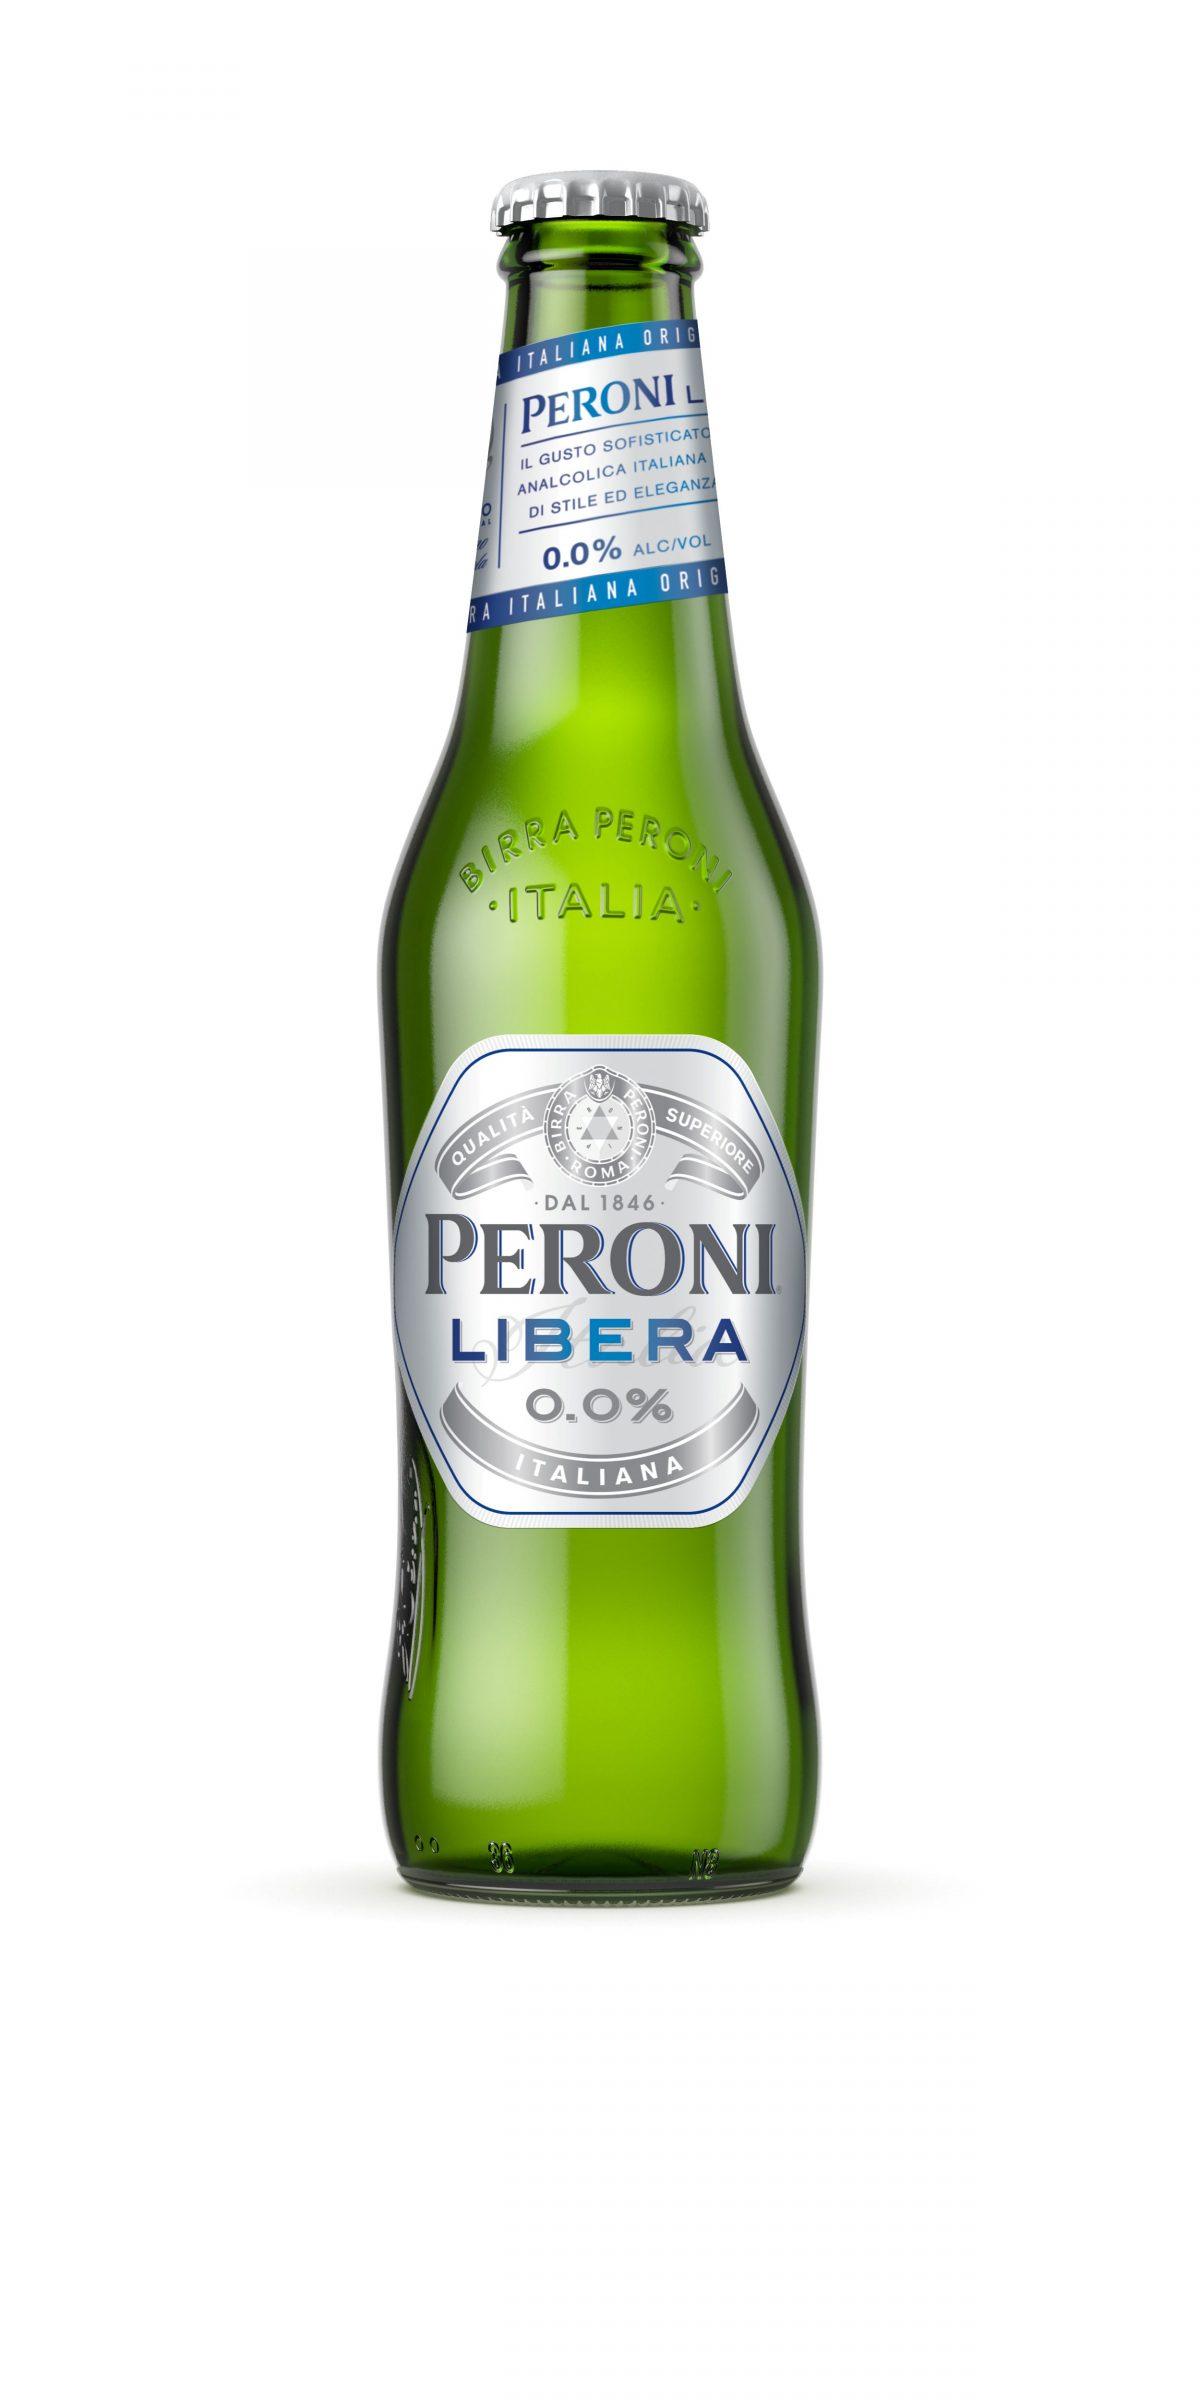 Peroni Libera 0.0% ABV